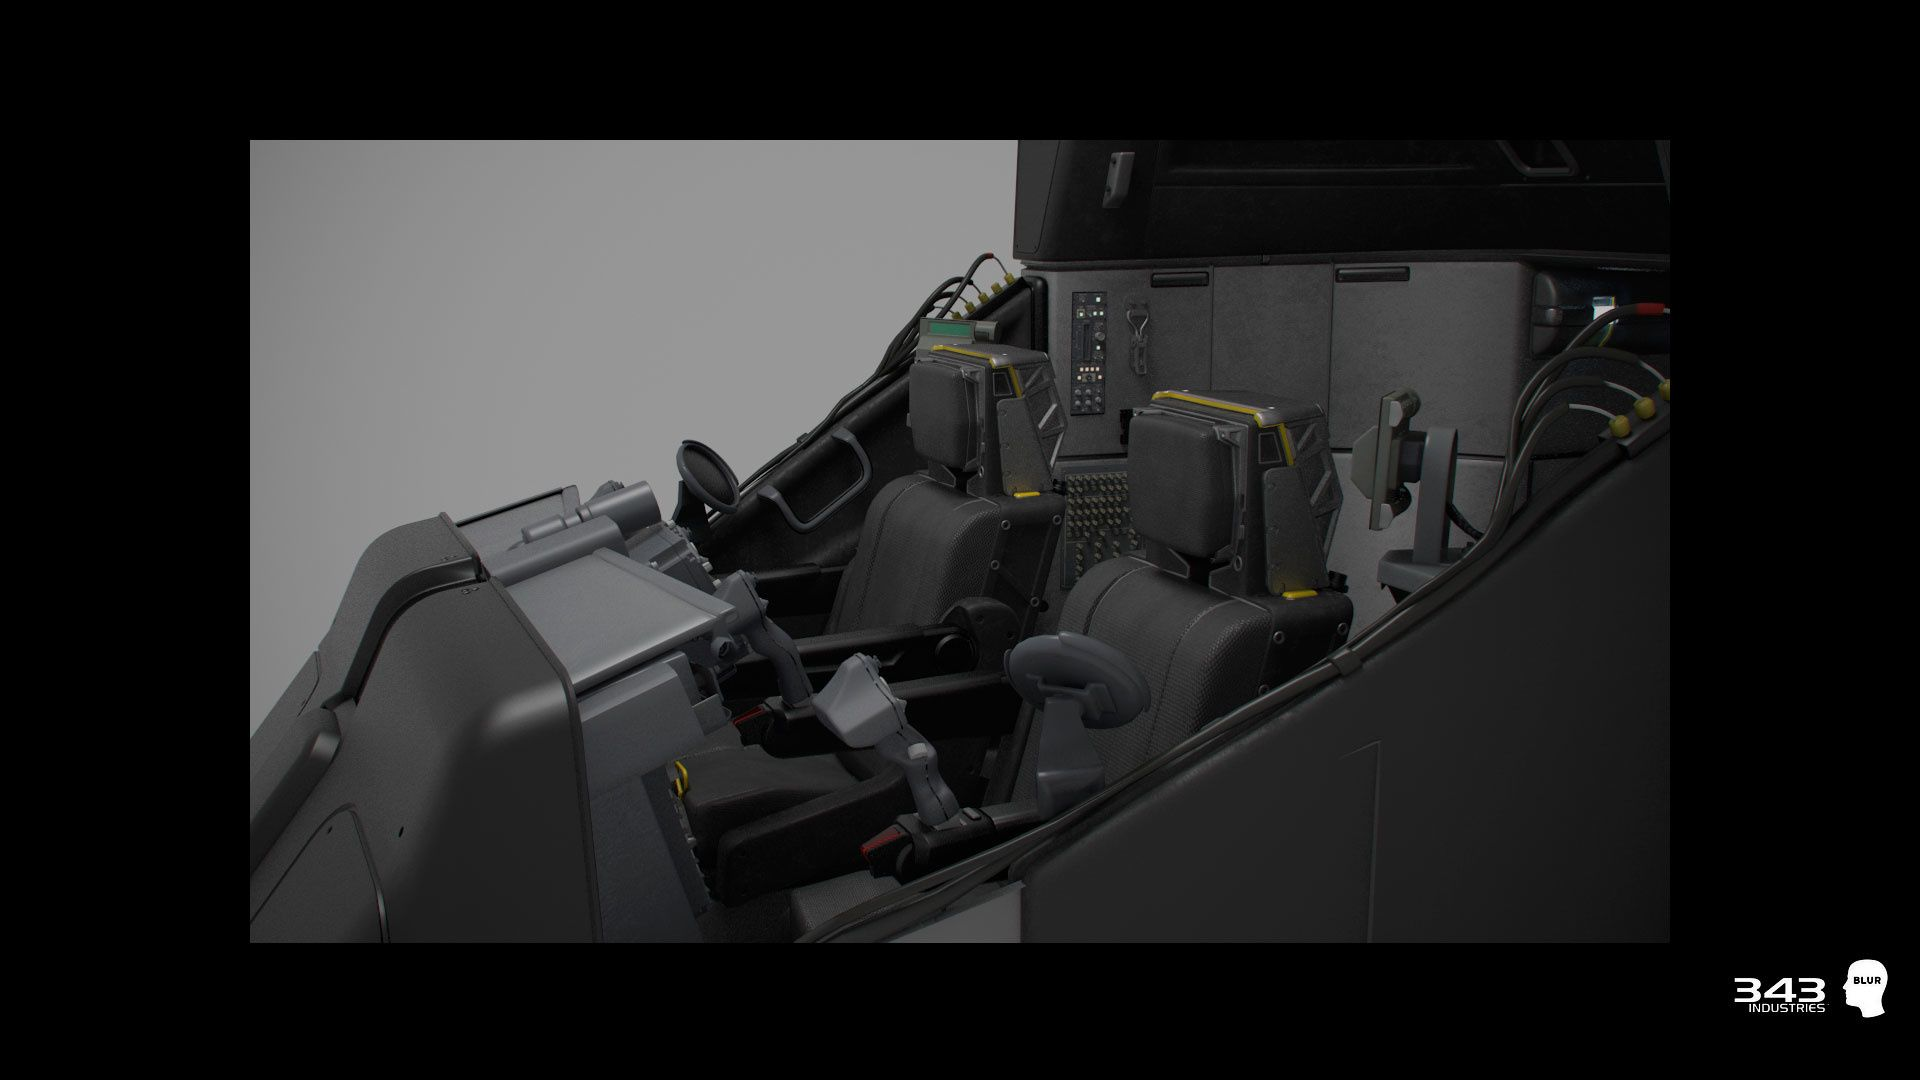 VANG CKI - HALO 2 ANNIVERSARY